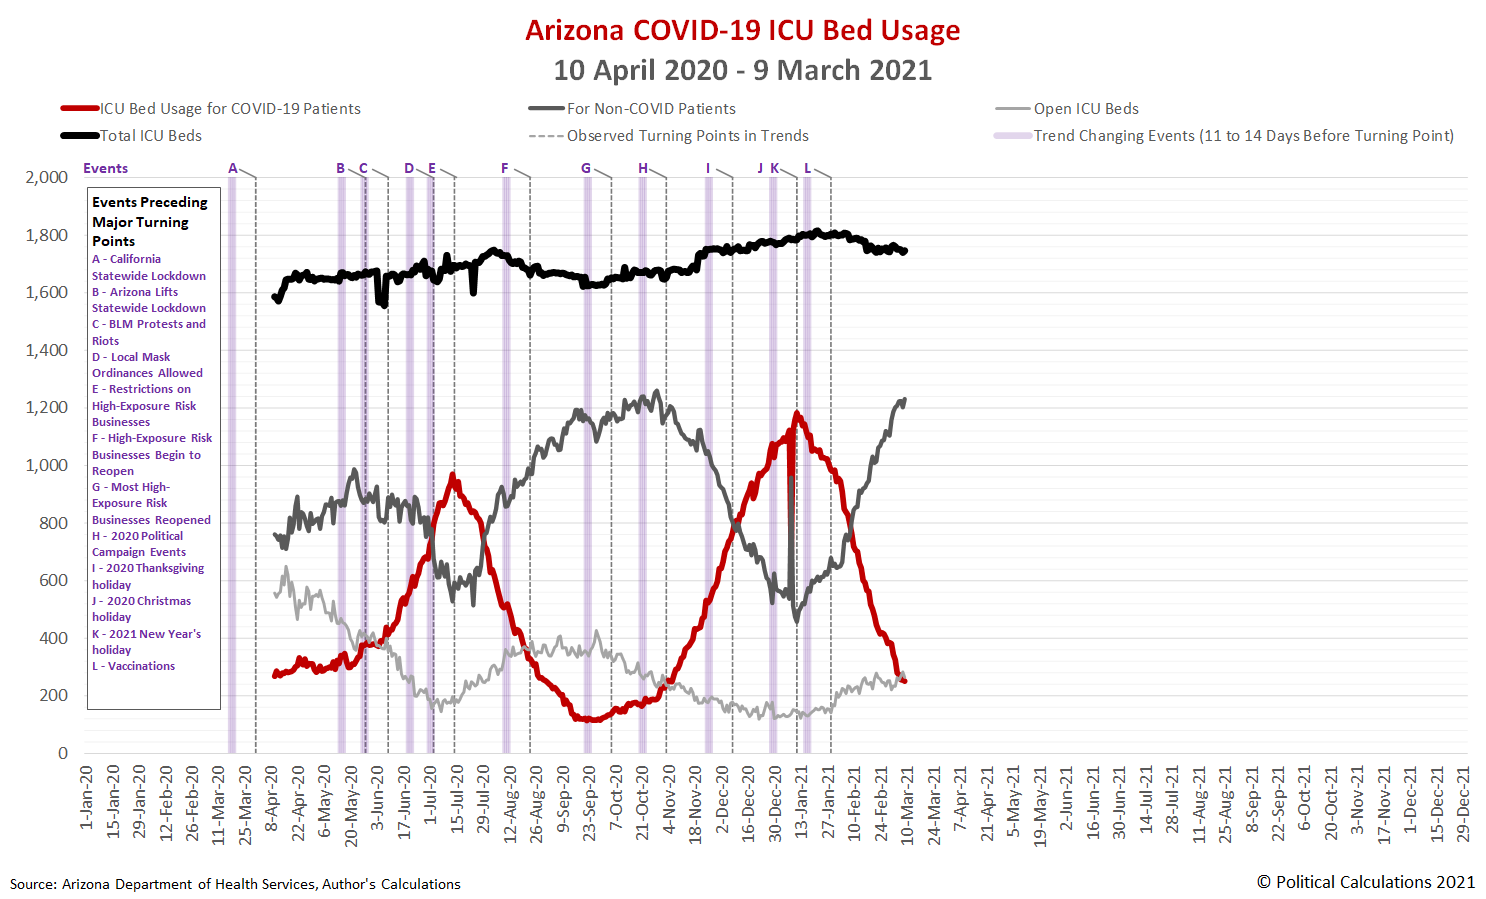 Arizona COVID-19 ICU Bed Usage, 10 April 2020 - 9 March 2021